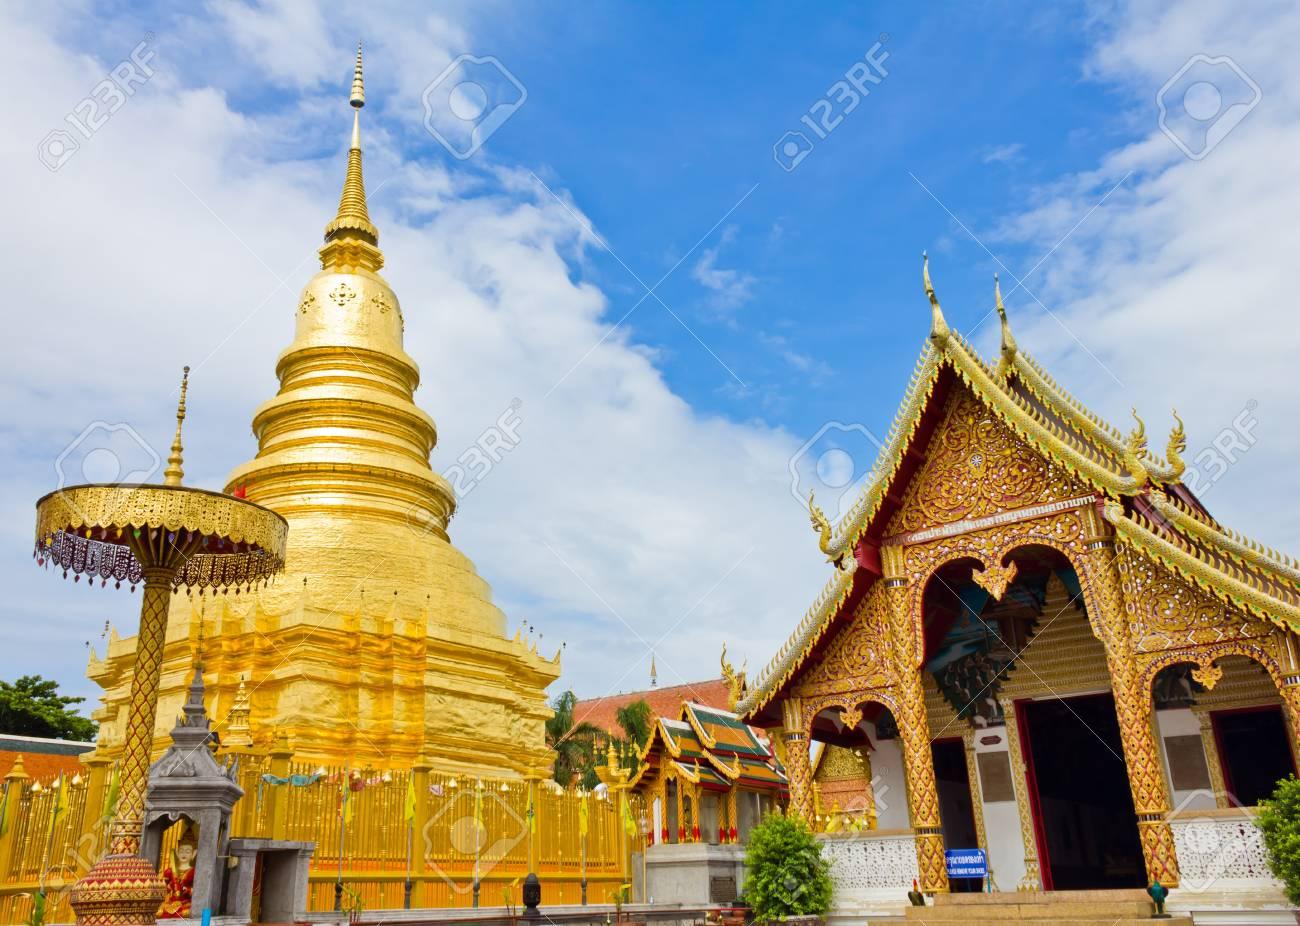 Wat phra that hariphunchai at Lamphun province, Thailand Stock Photo - 14129535